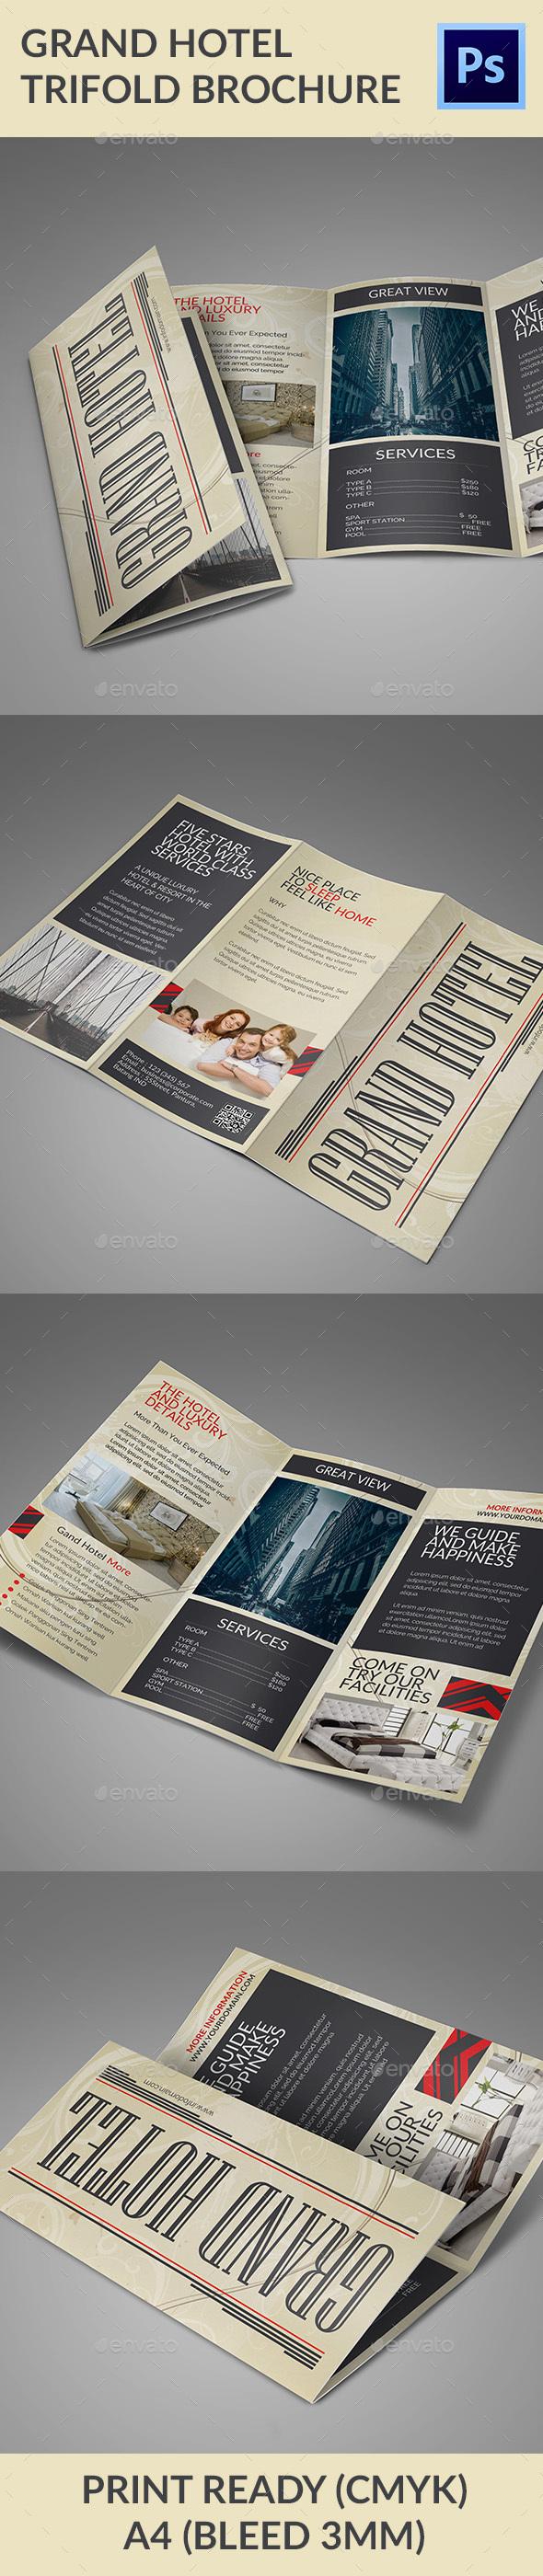 Grand Hotel Trifold Brochure - Informational Brochures